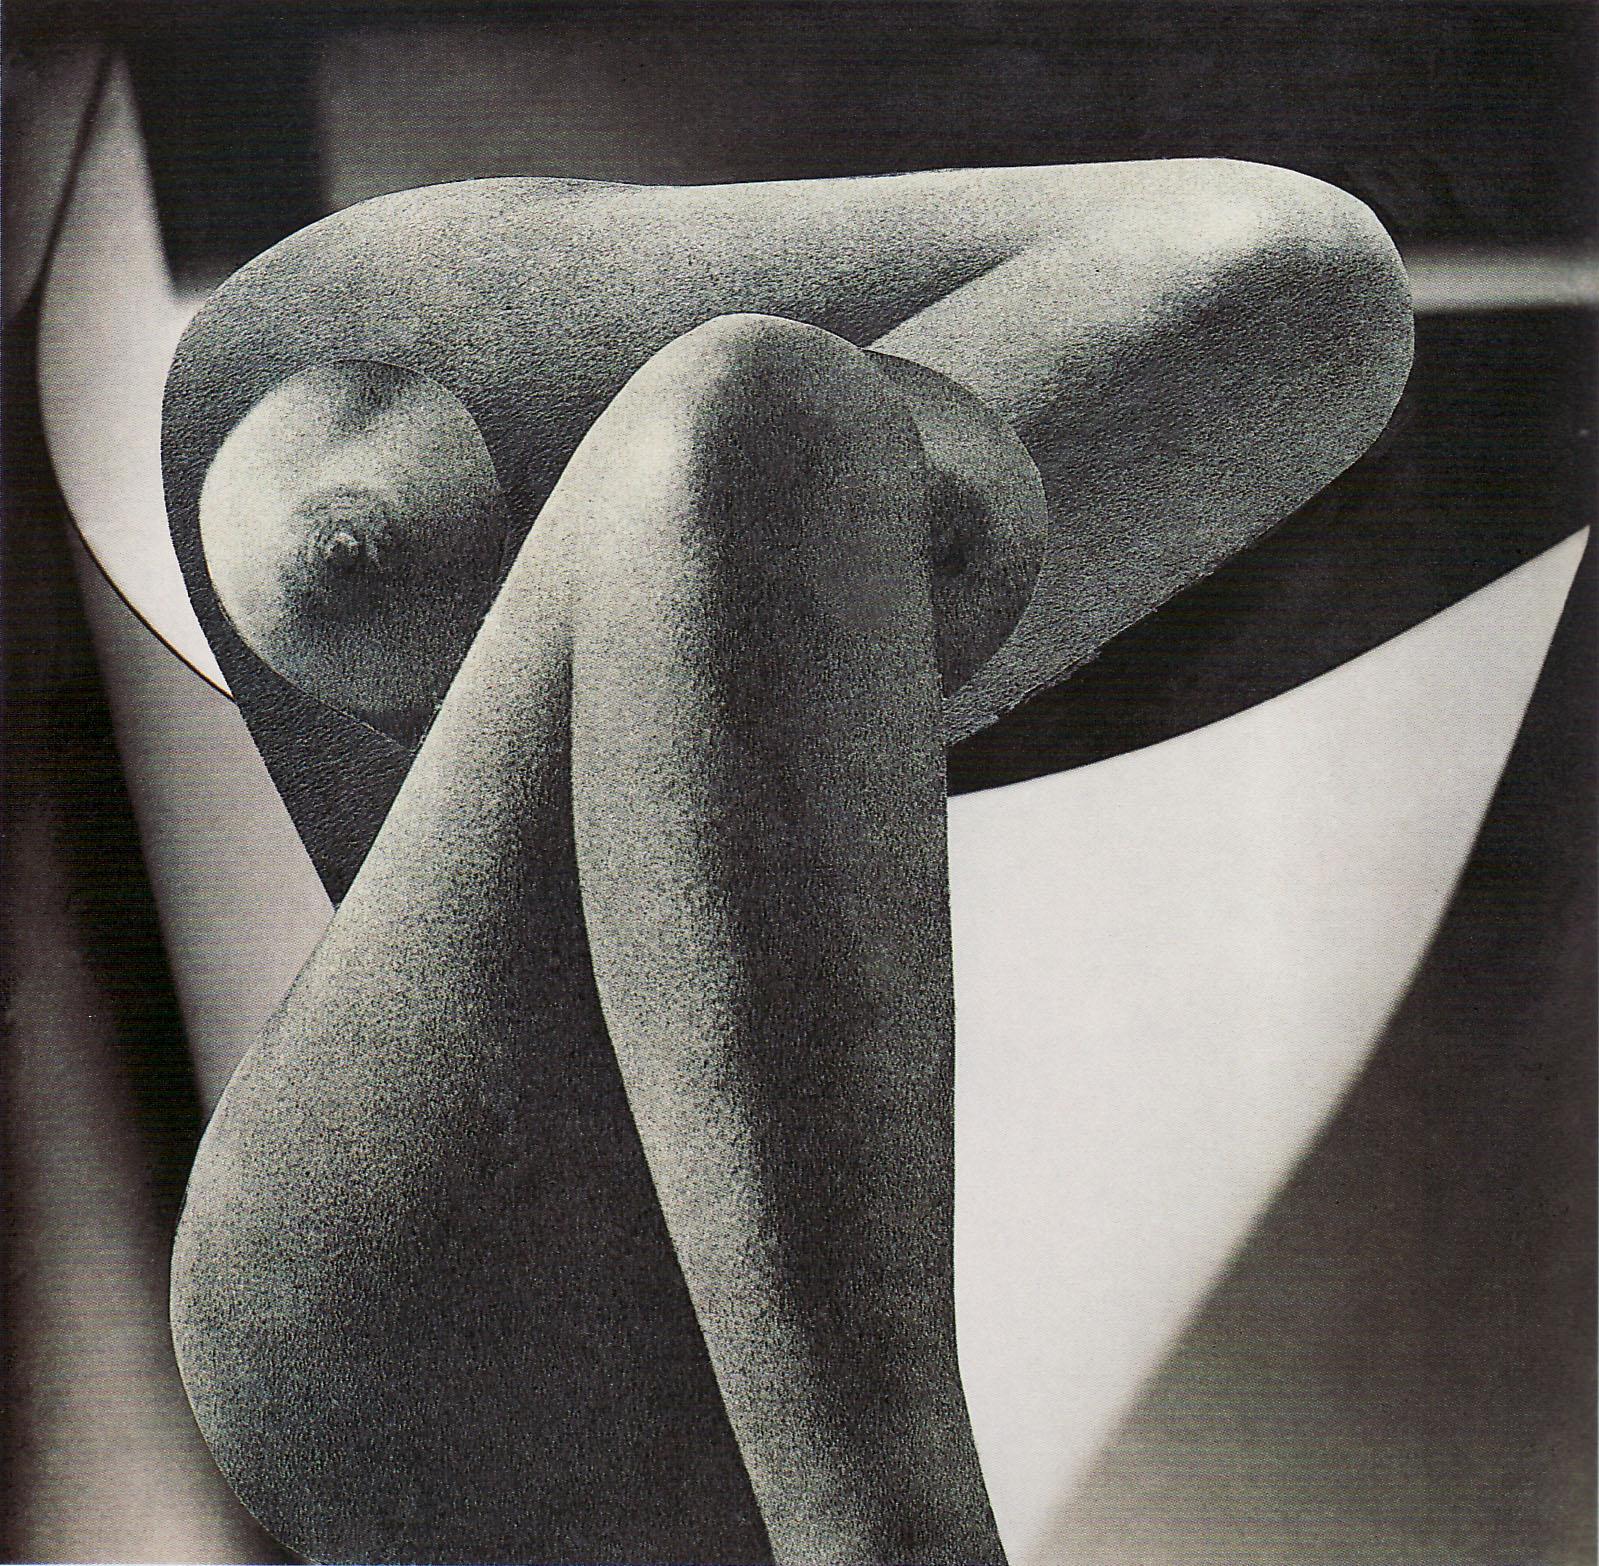 Karel Teige- Collage #347, 1948. (c) Nachlass Karel Teige